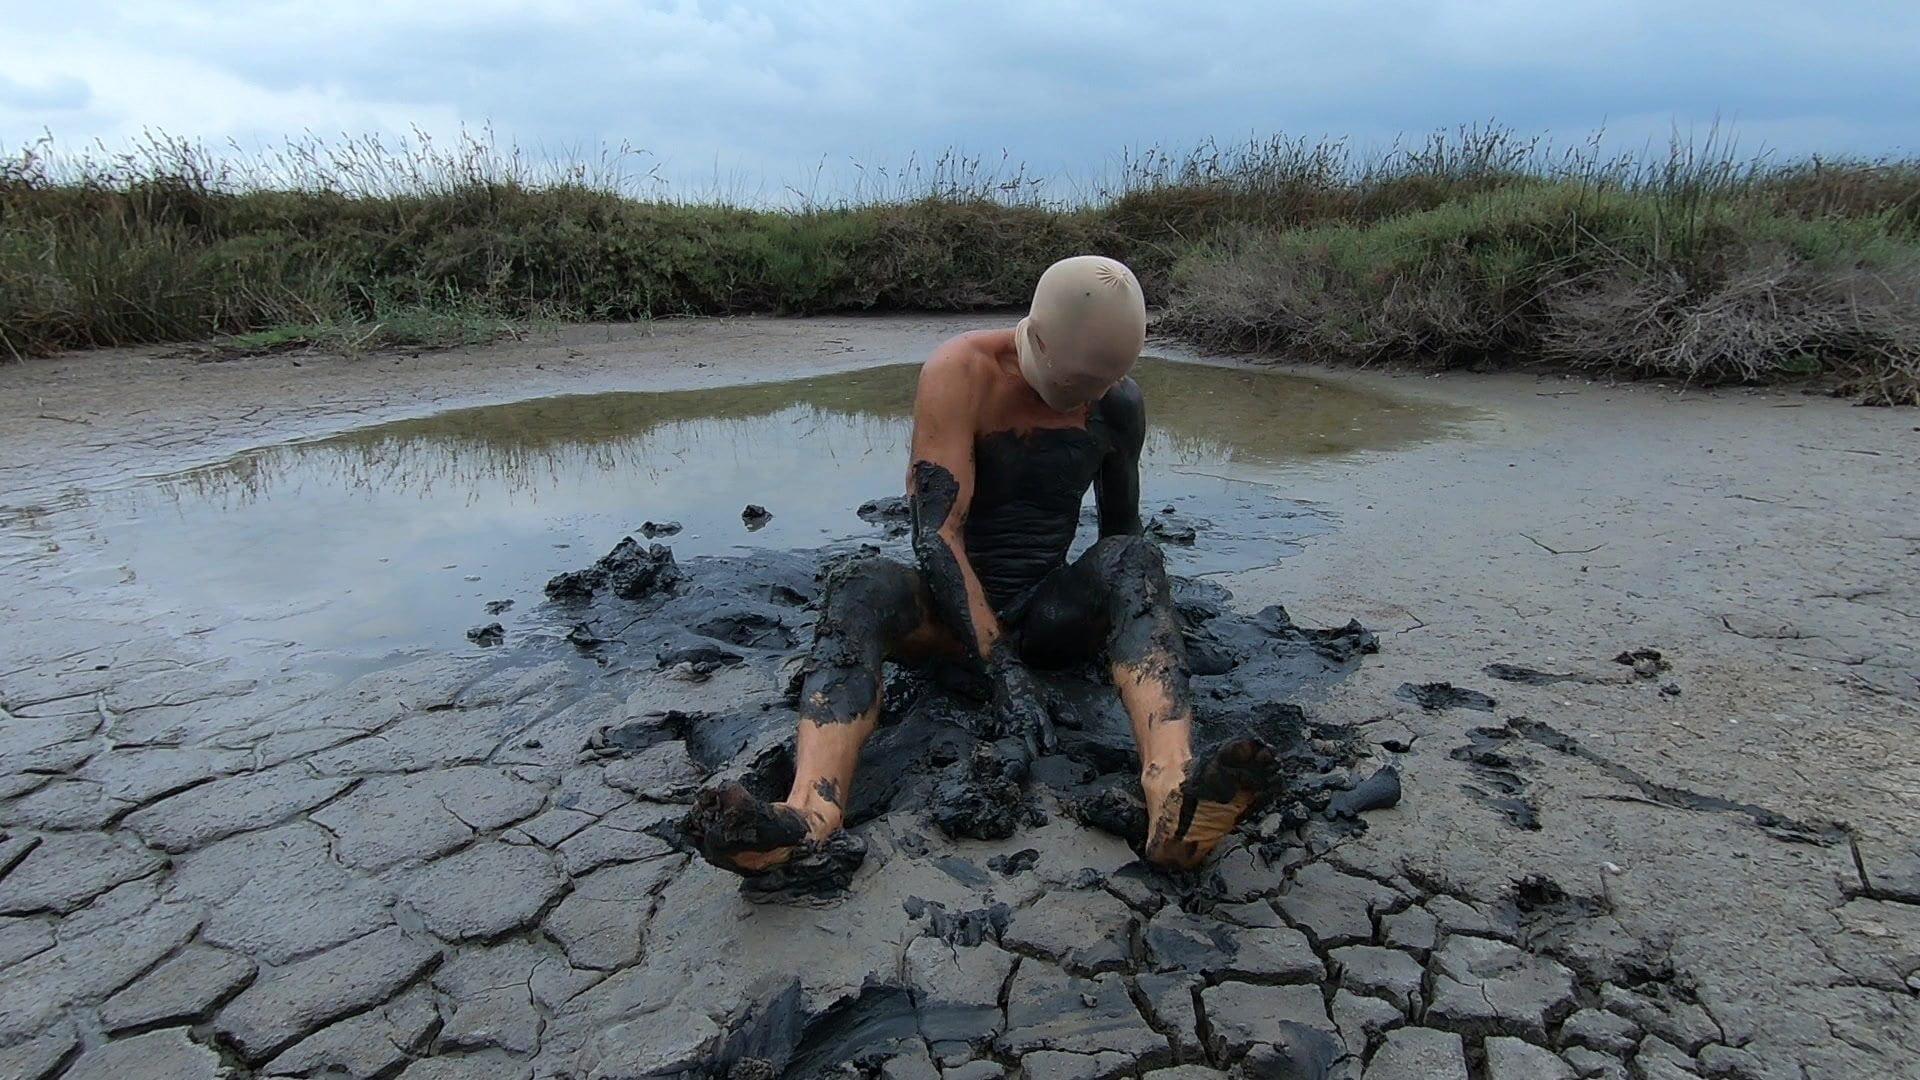 Muddy on the lake